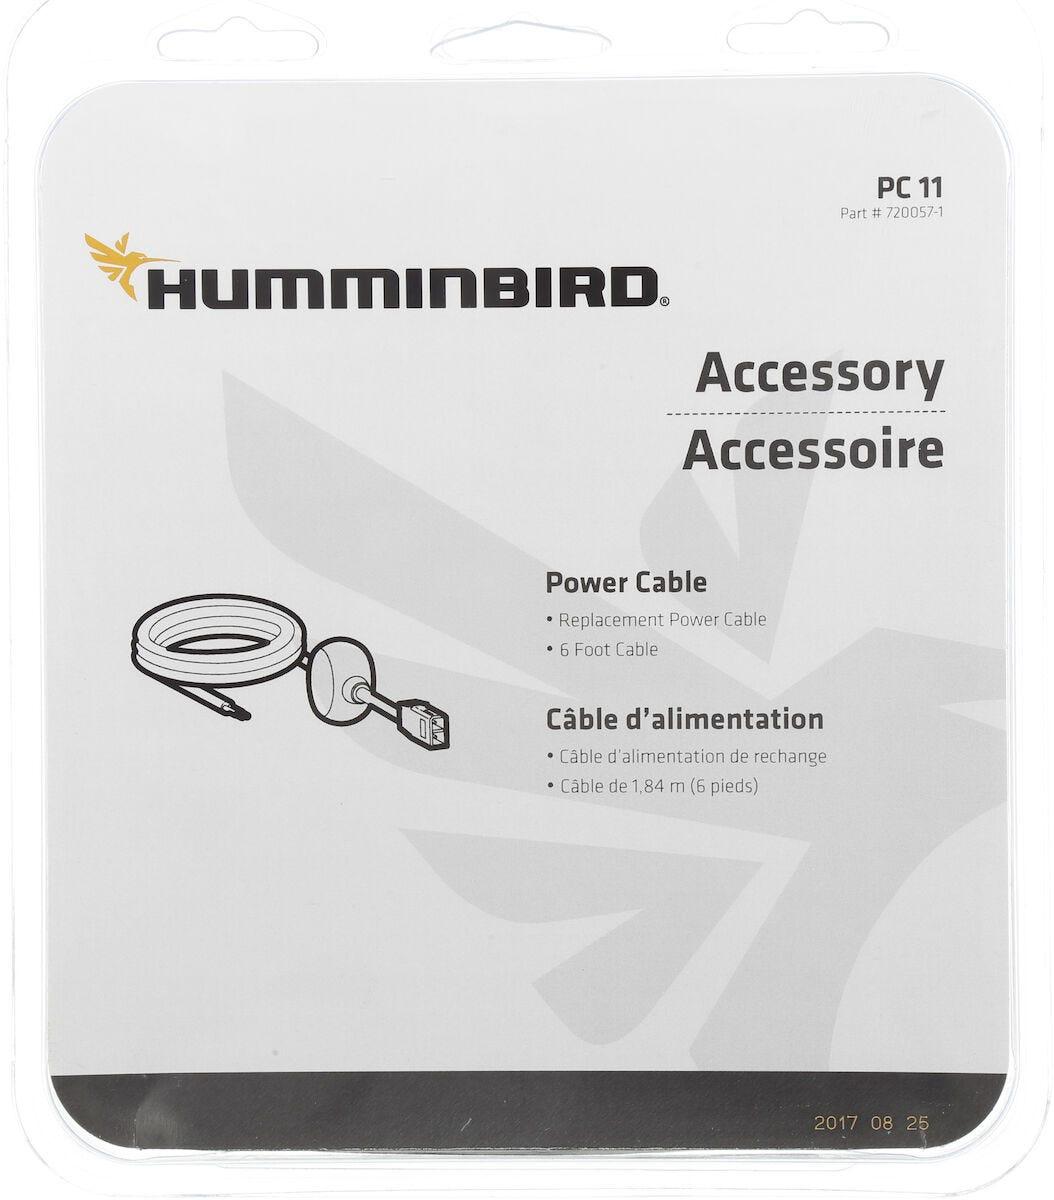 720057-1 Humminbird PC11 Power Cord